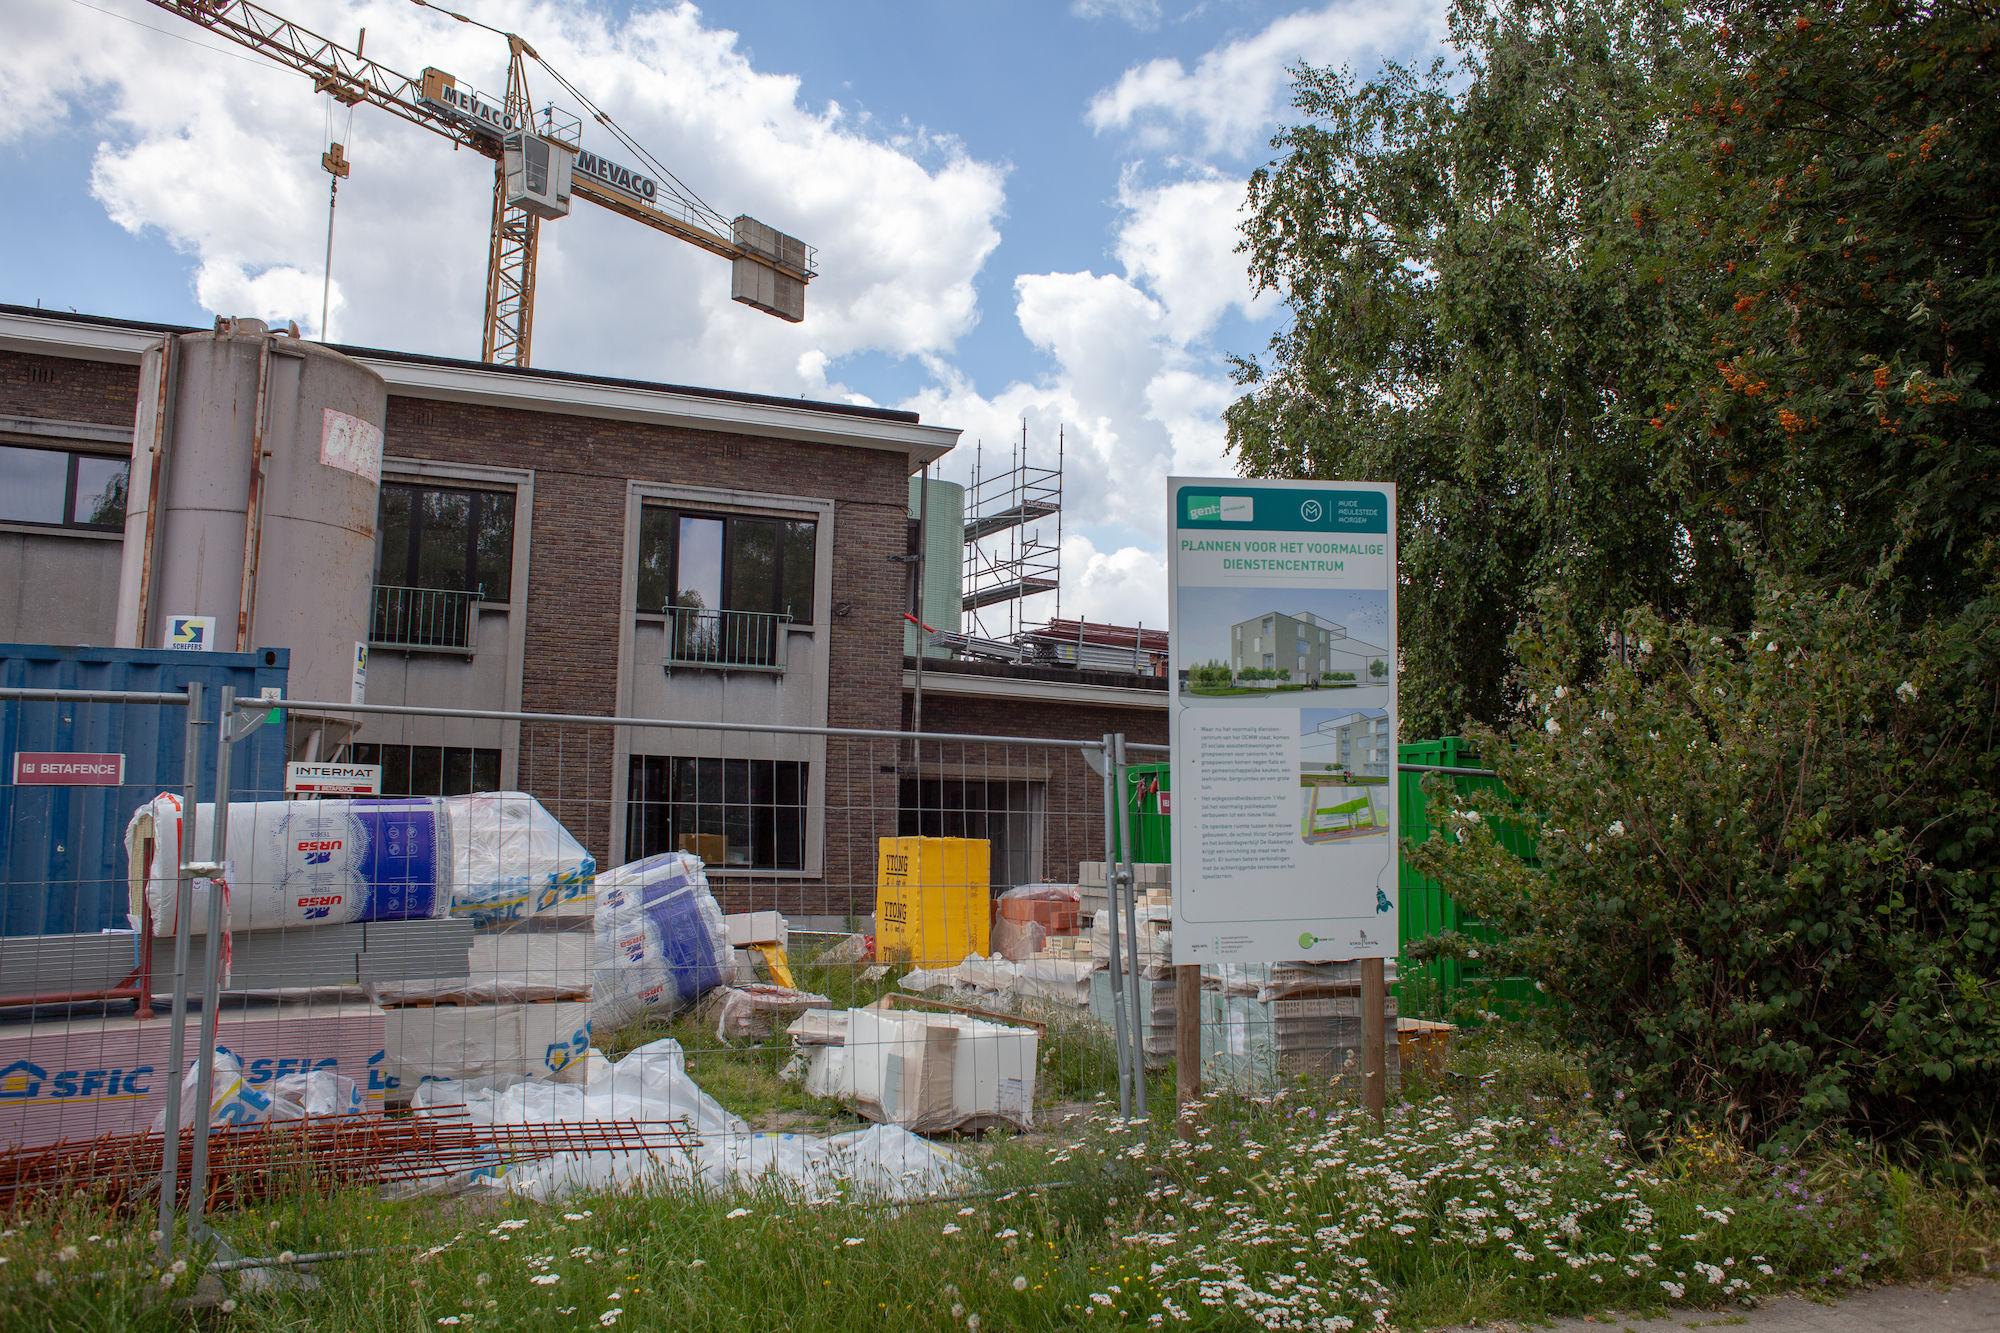 2019-07-02 Muide Meulestede prospectie Wannes_stadsvernieuwing_IMG_0325-2.jpg